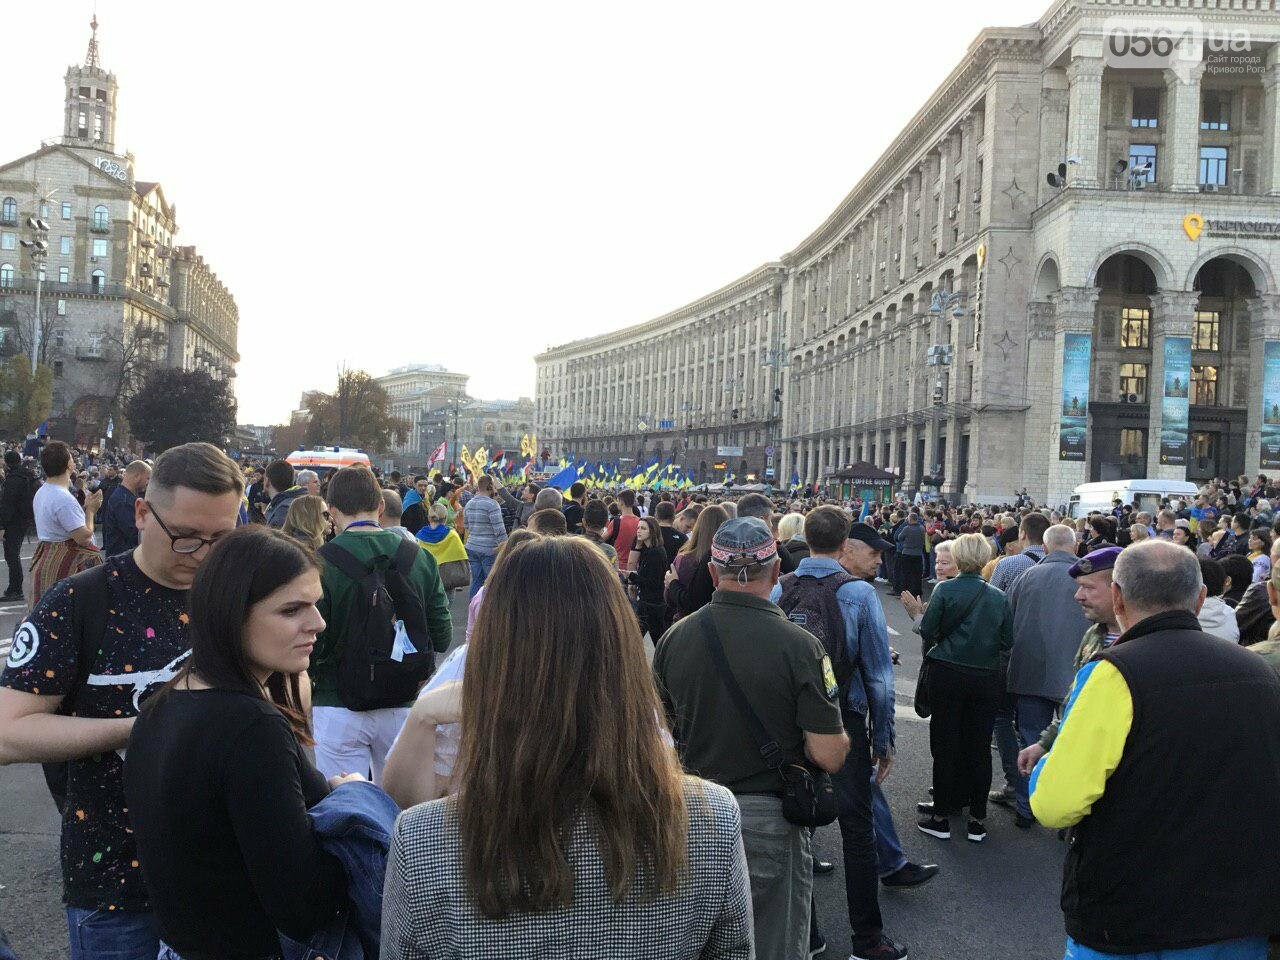 Криворожане поддержали Марш сопротивления капитуляции в Киеве, - ФОТО, ВИДЕО, ОБНОВЛЕНО, фото-26